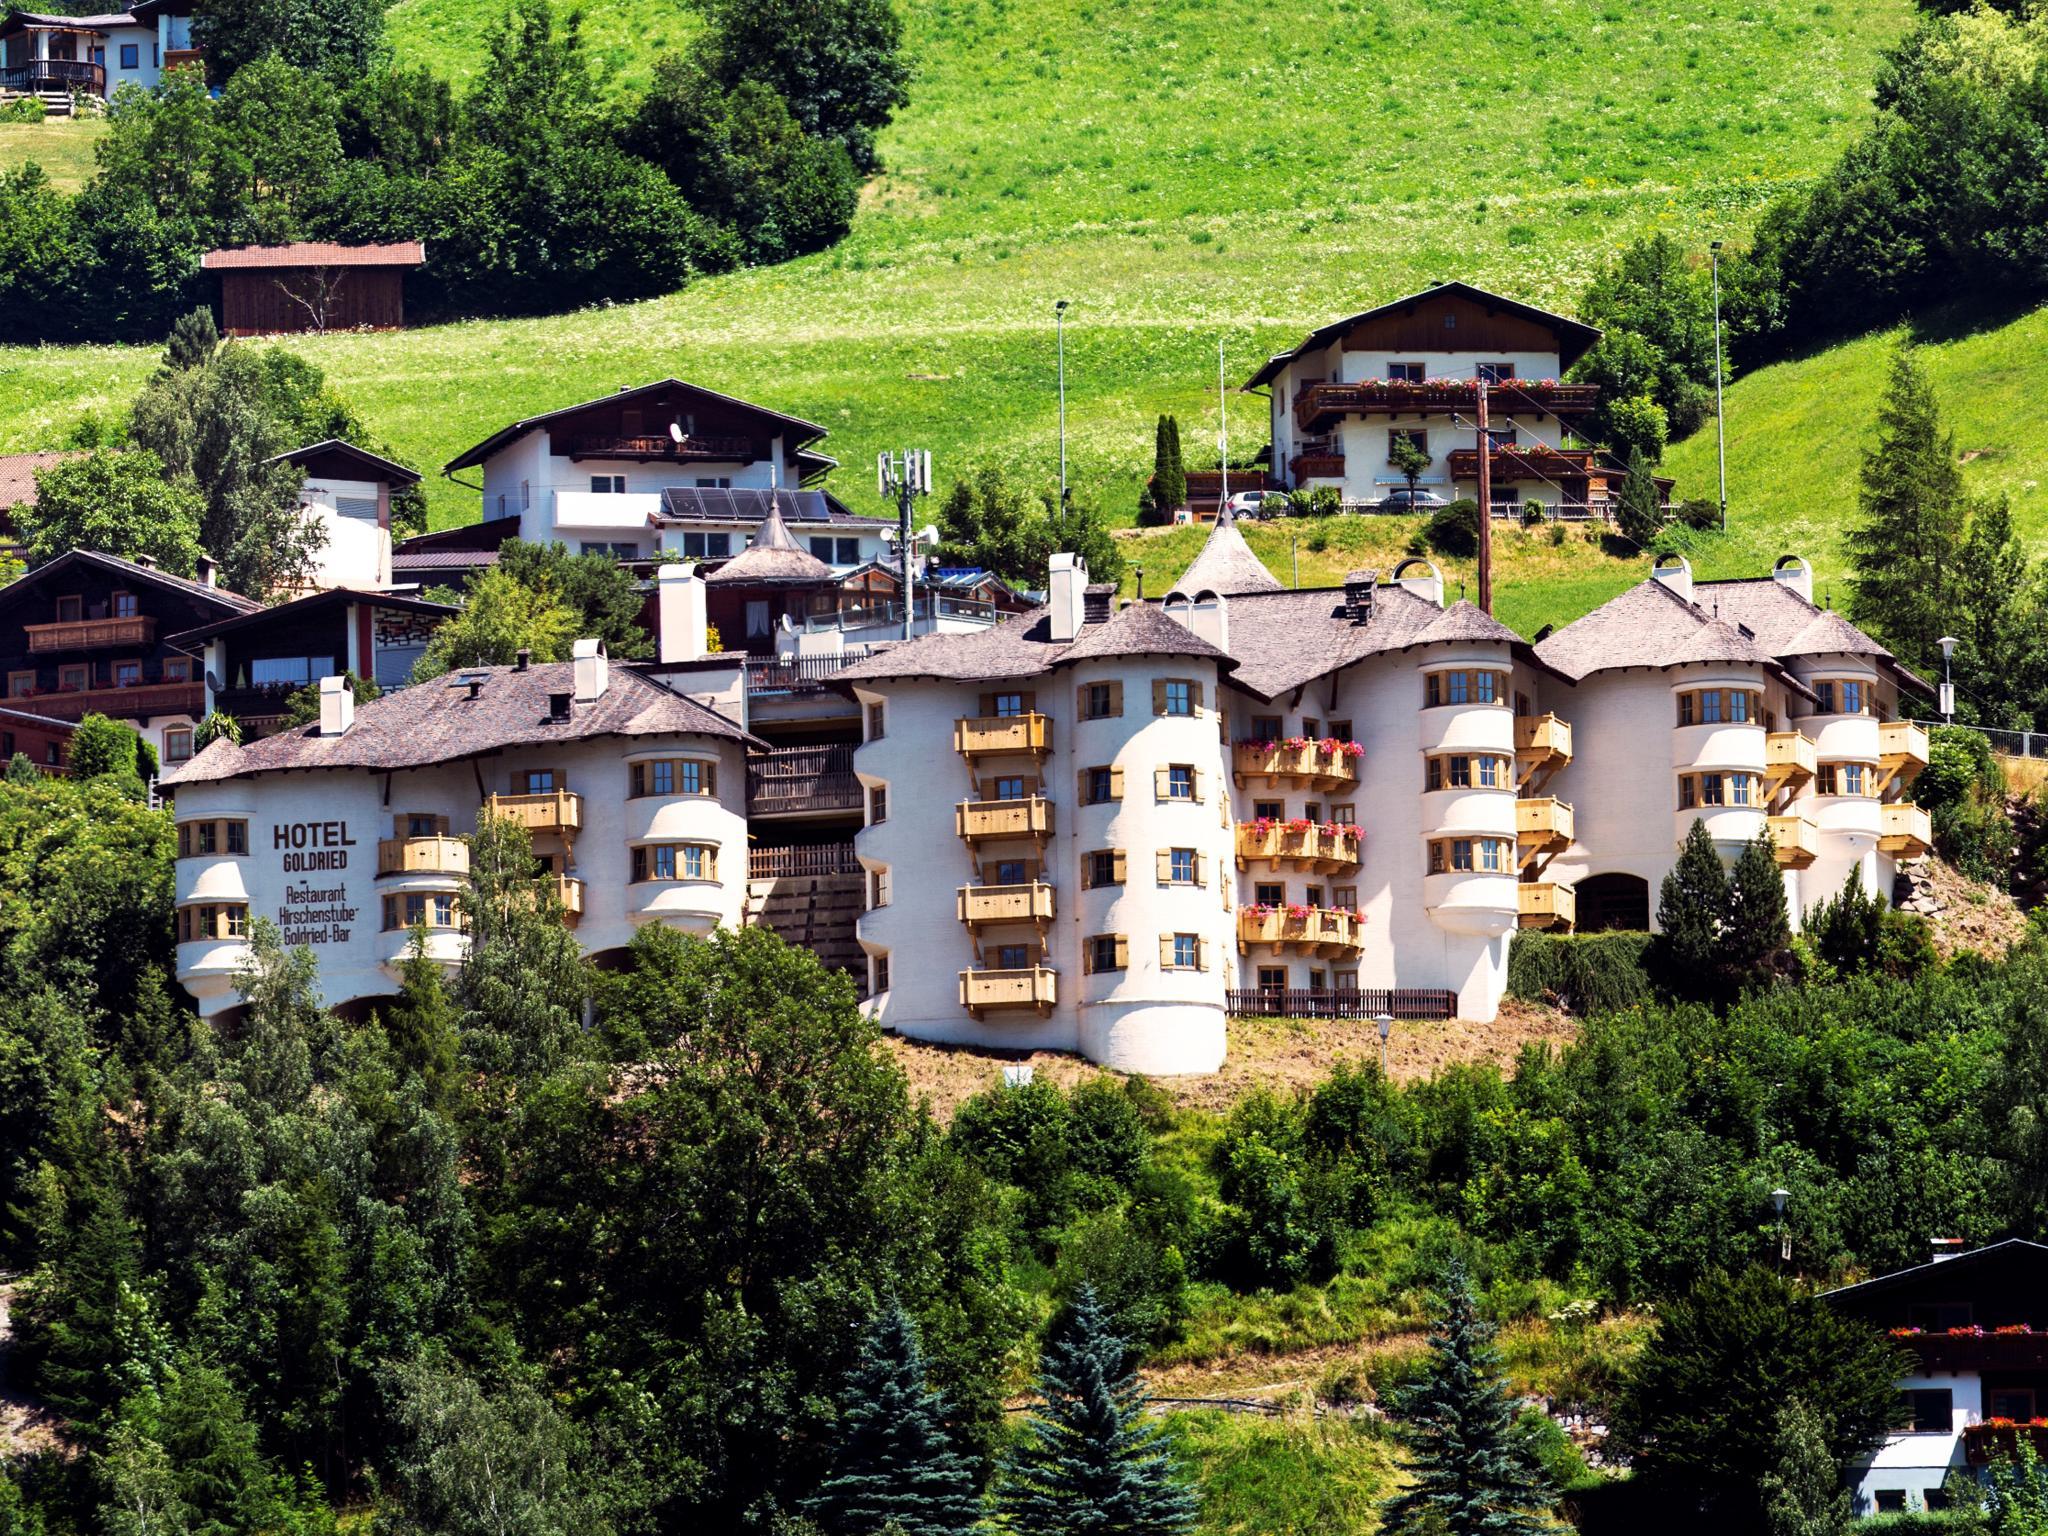 Goldried Park 90 Tirol